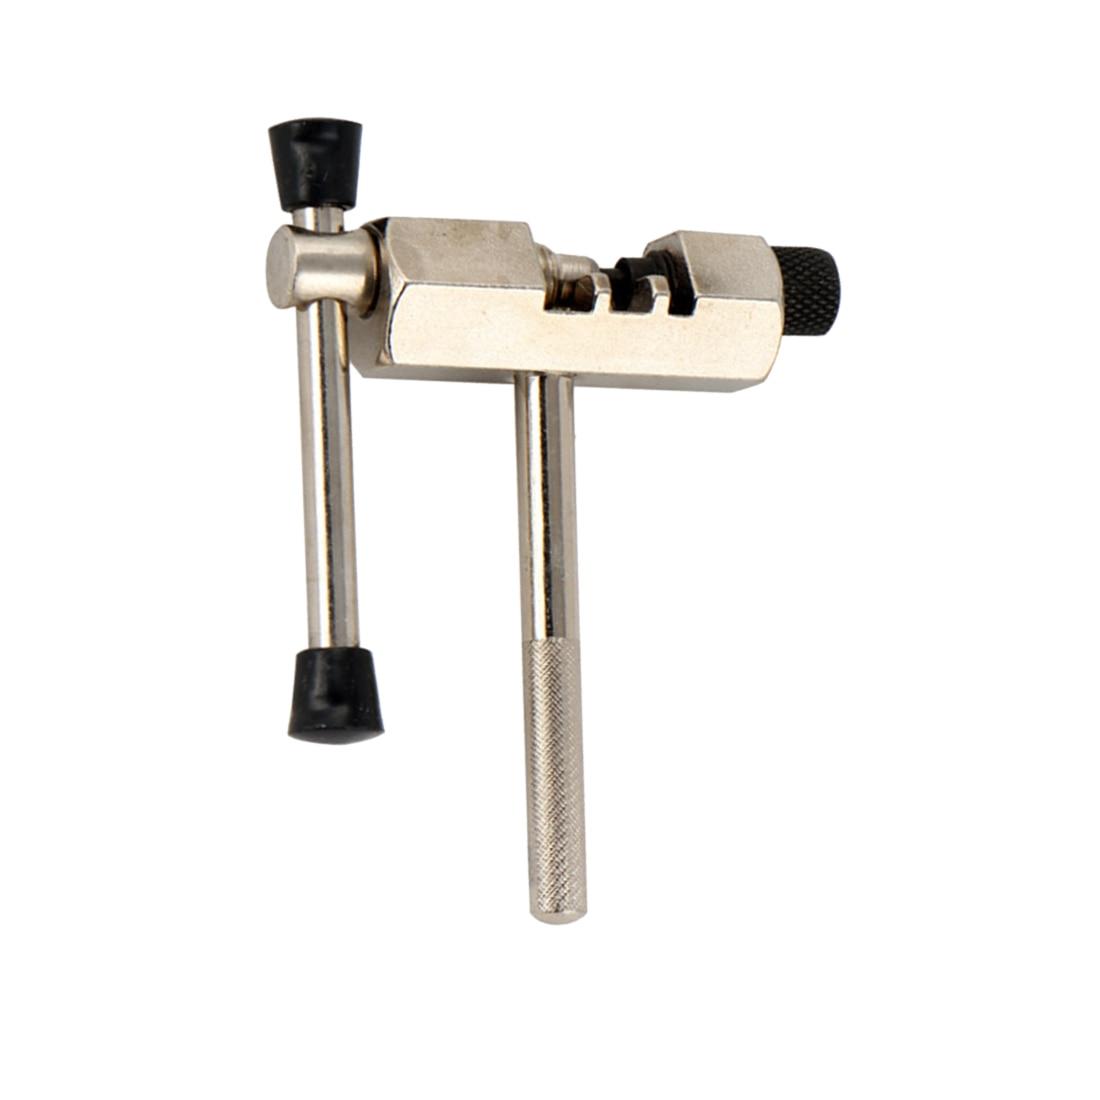 Stainless Steel Bike Cycling Bicycle Chain Breaker Splitter Cutter Repair Tool